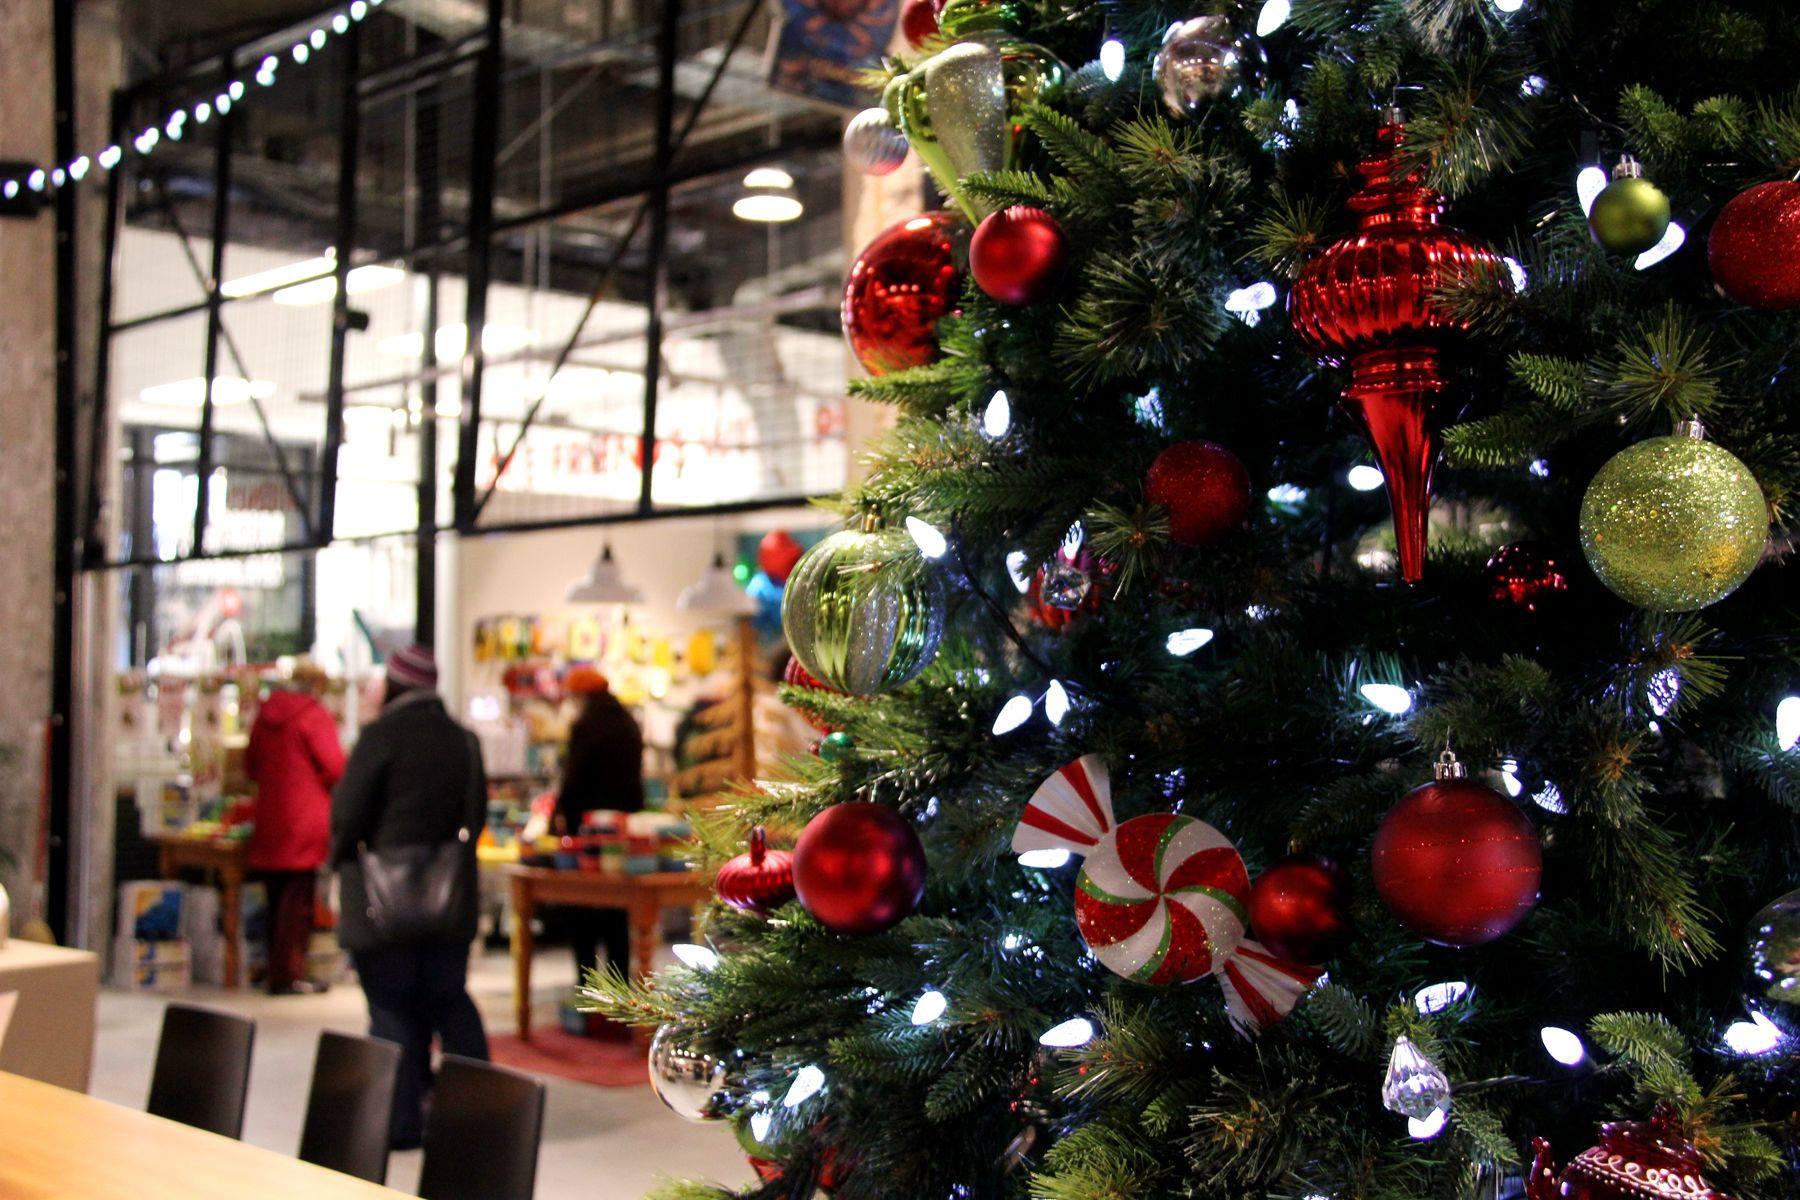 Victoria Public Market Christmas